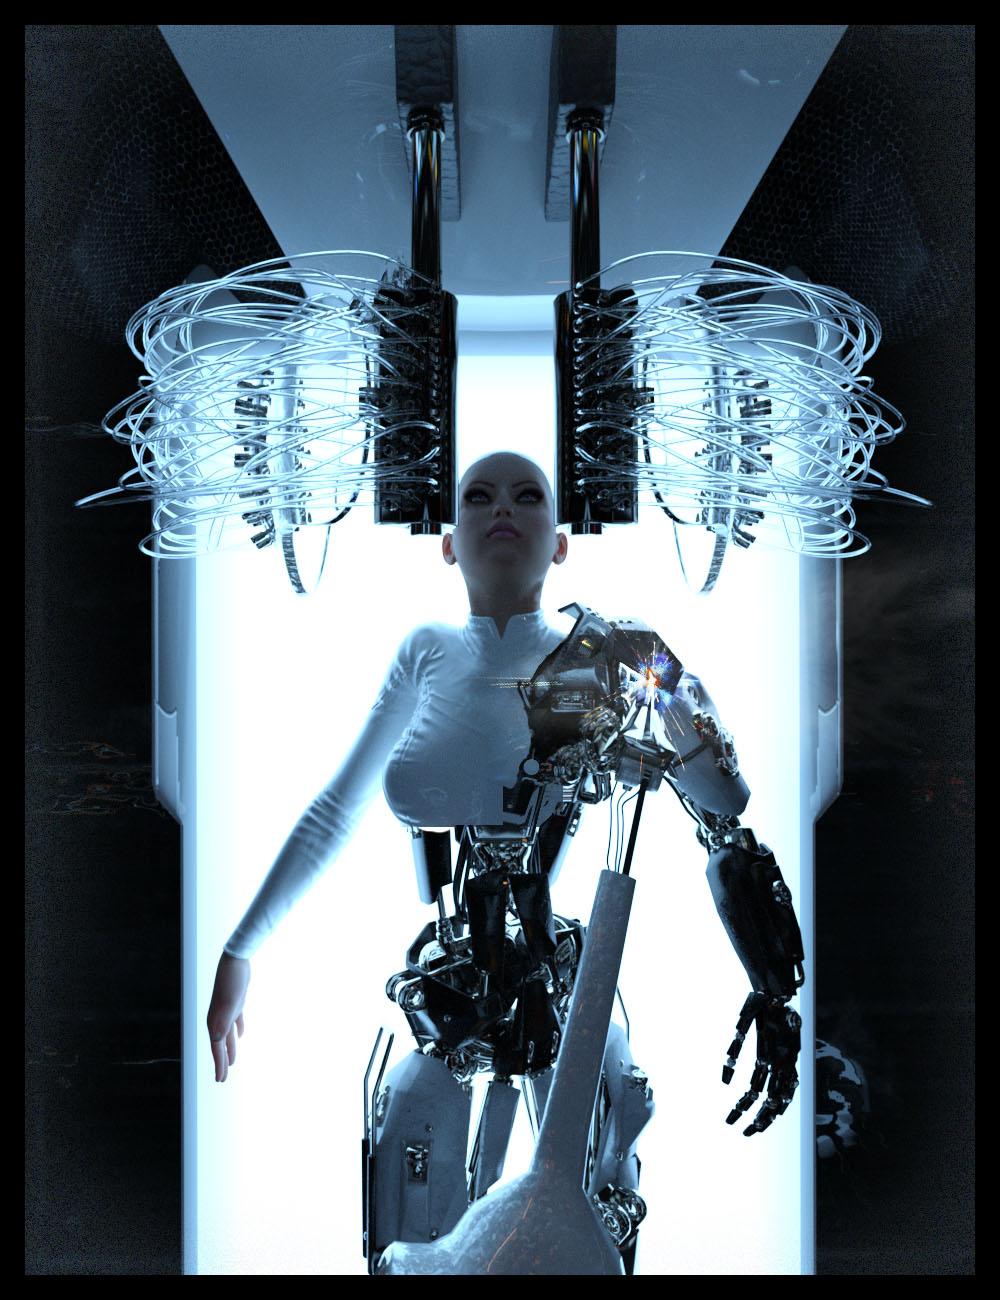 Robotics Lab by: Studio360, 3D Models by Daz 3D